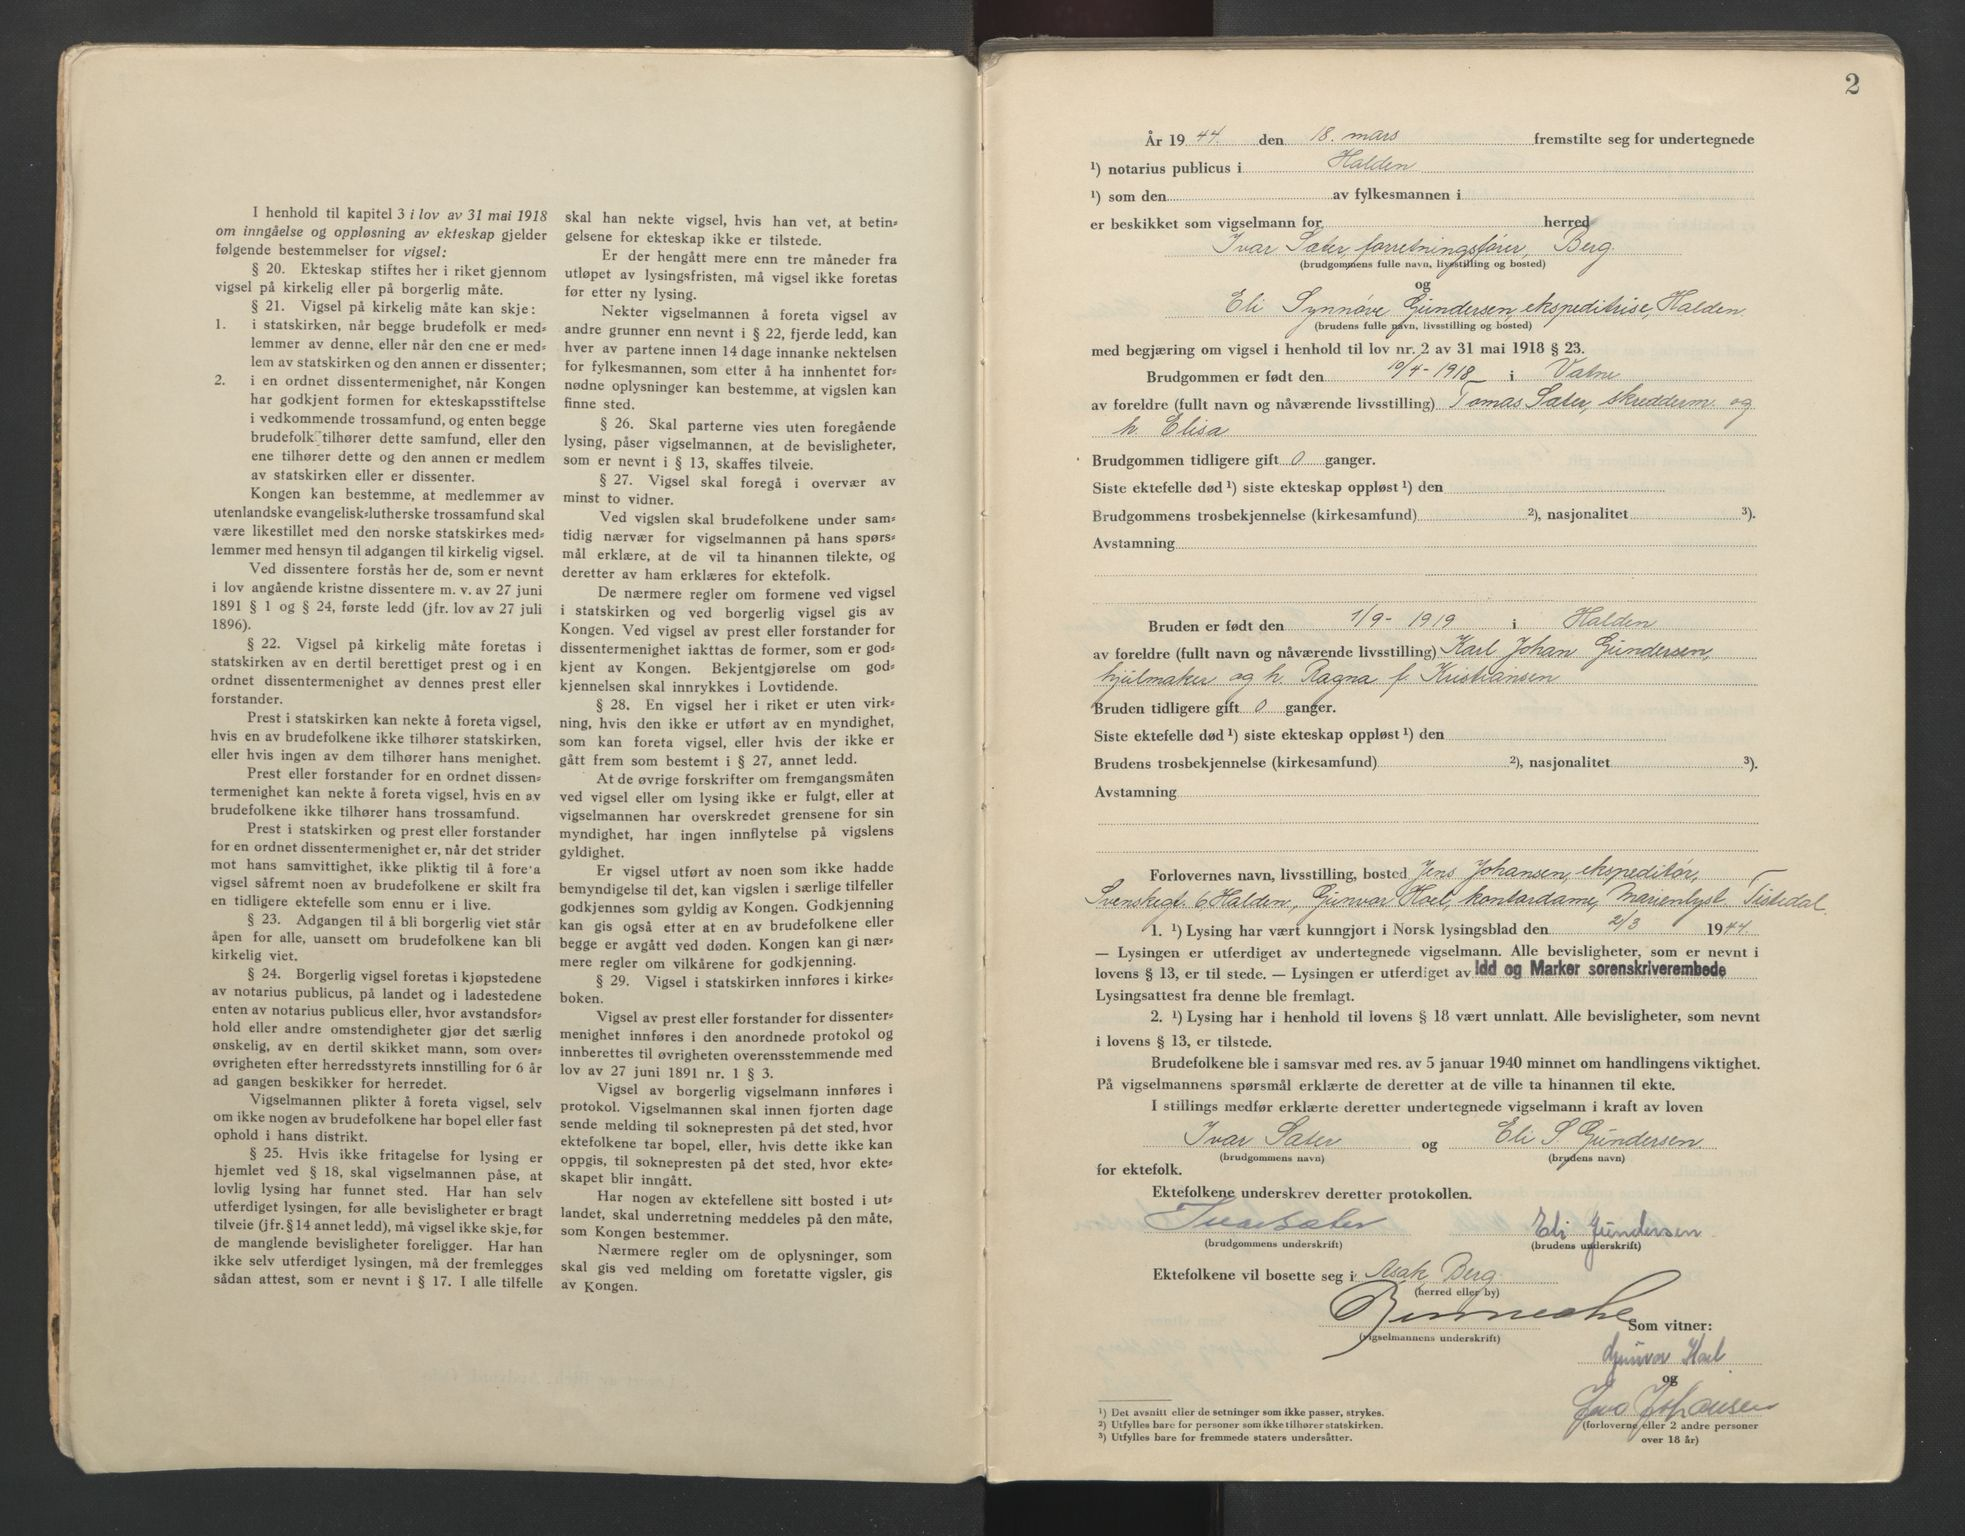 SAO, Idd og Marker sorenskriveri, L/Lc/L0001: Vigselsbøker, 1944-1945, s. 2